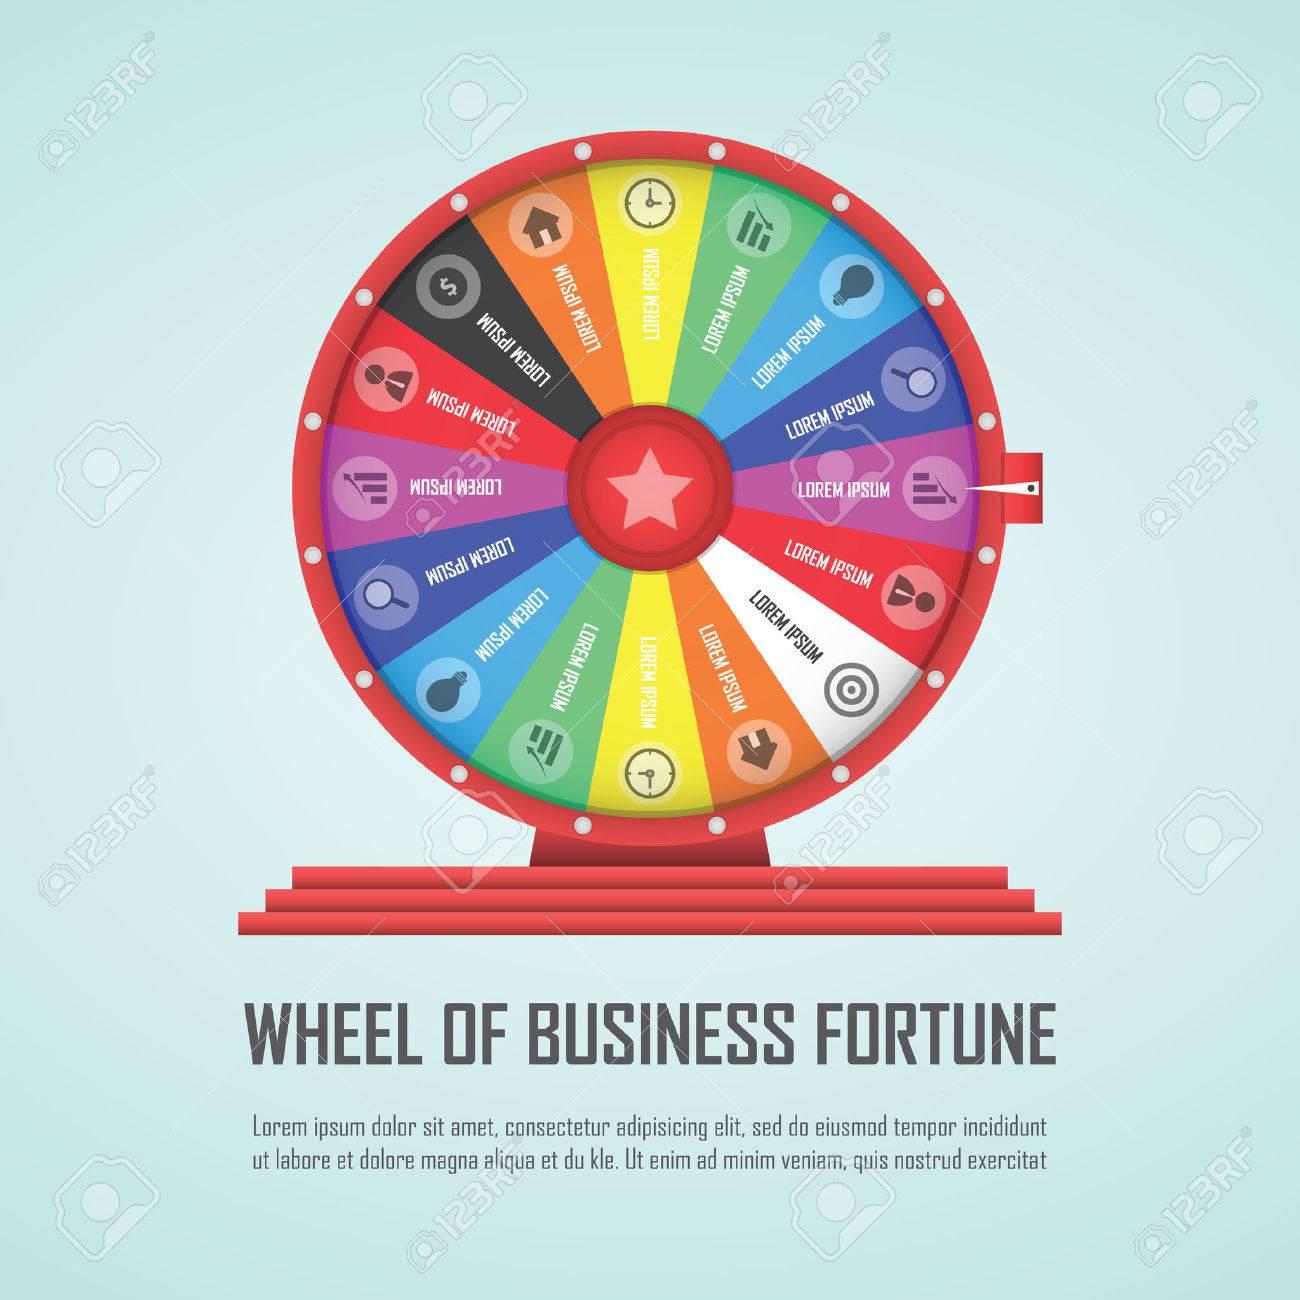 Wheel of fortune infographic design element - 39768545